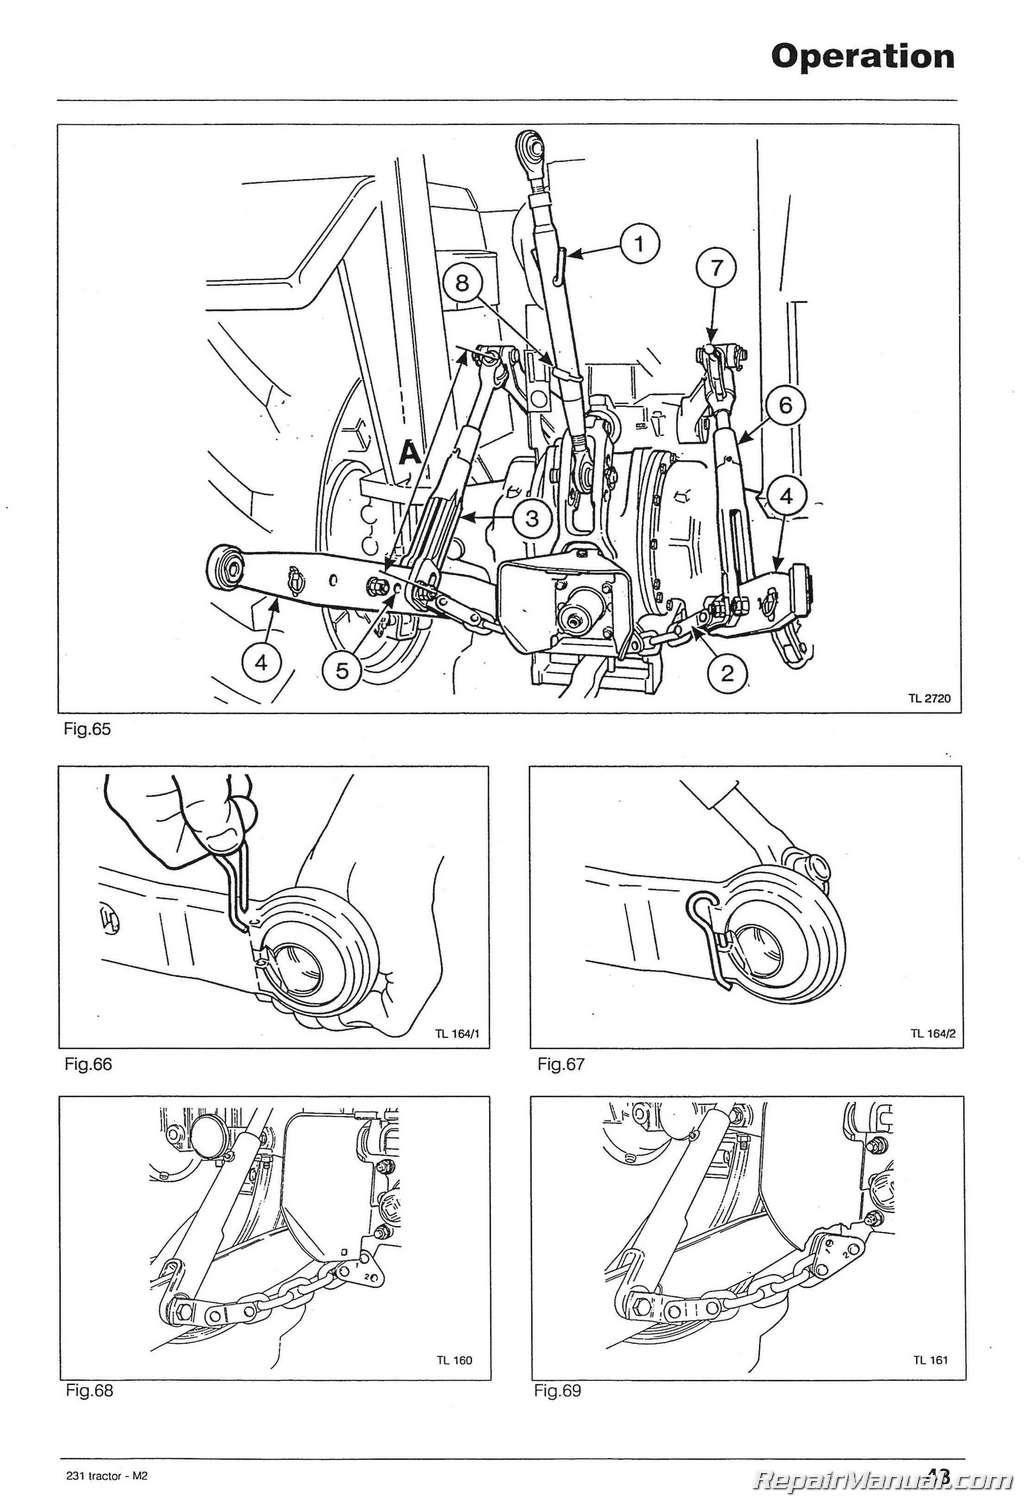 hight resolution of mahindra tractor wiring diagram on mahindra tractor wiring diagrammahindra tractor wiring diagrams toyskidsco